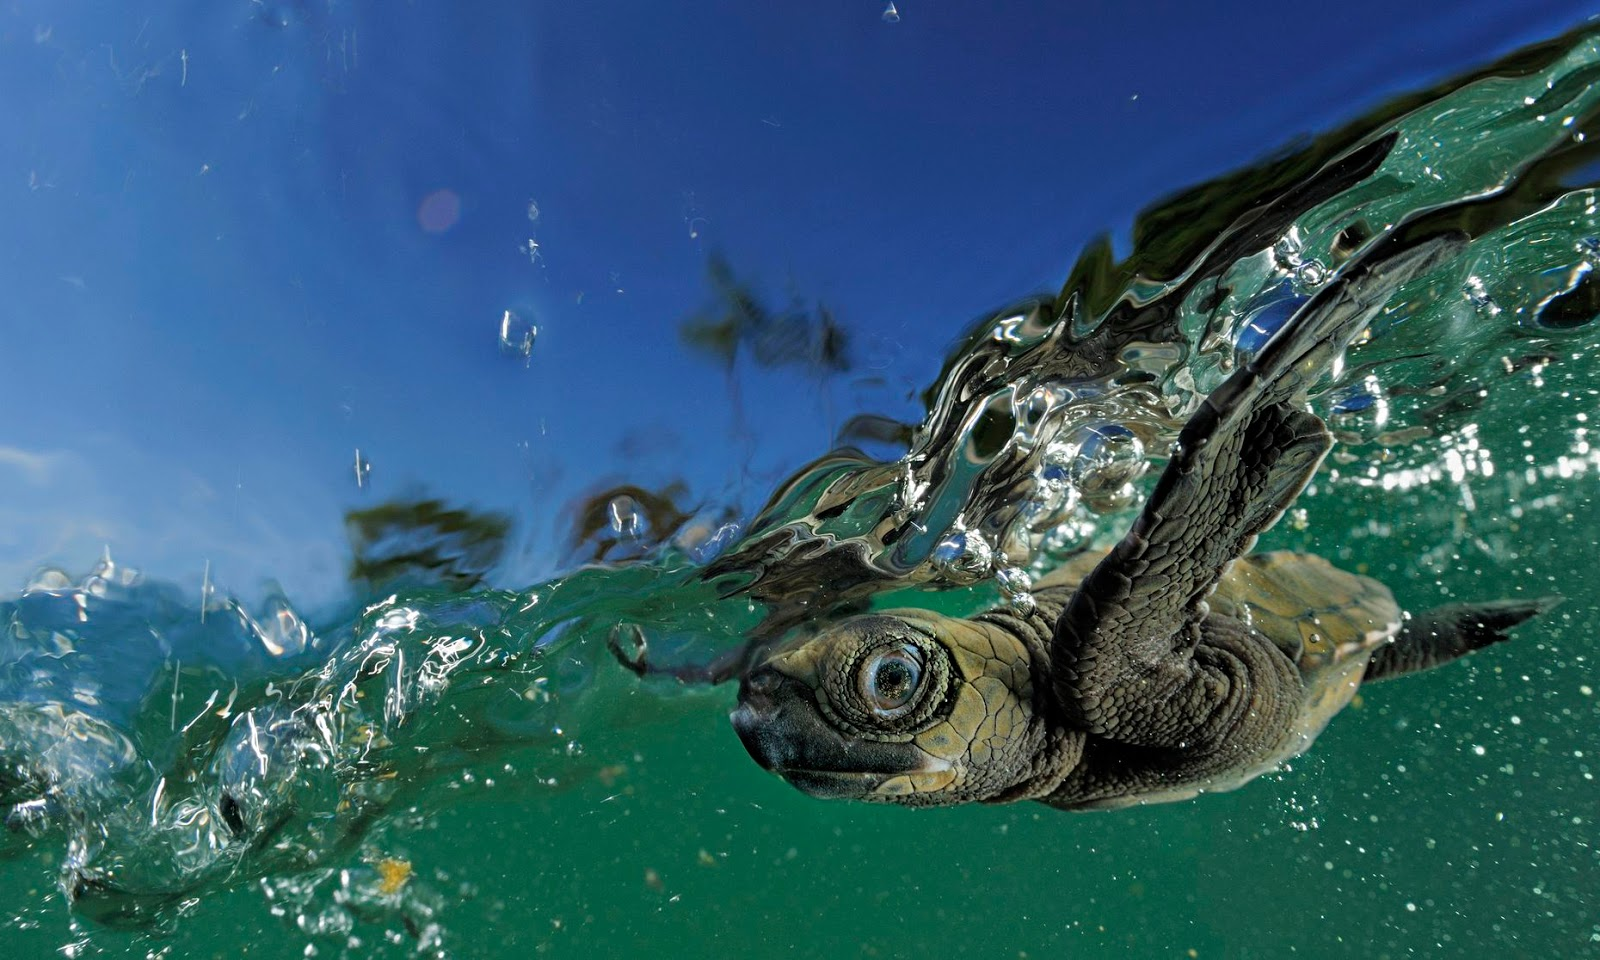 http://www.theguardian.com/technology/2014/may/09/olive-ridley-turtle-swim-start-life-ganjam-beaches-india